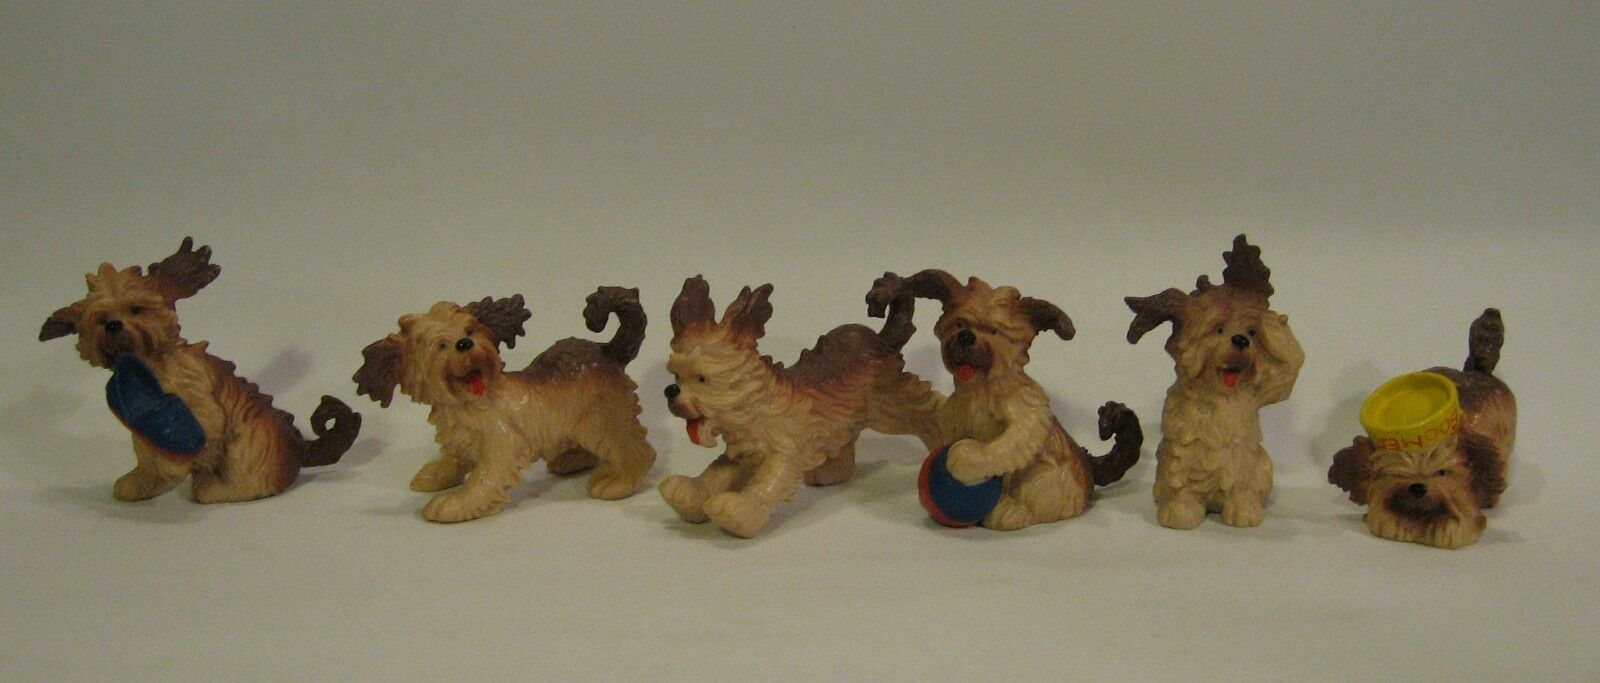 RARE HERE'S BOOMER (BOOMER DOG), 6 PVC FIGURES MAIA & BORGES M+B PORTUGAL, 1981.